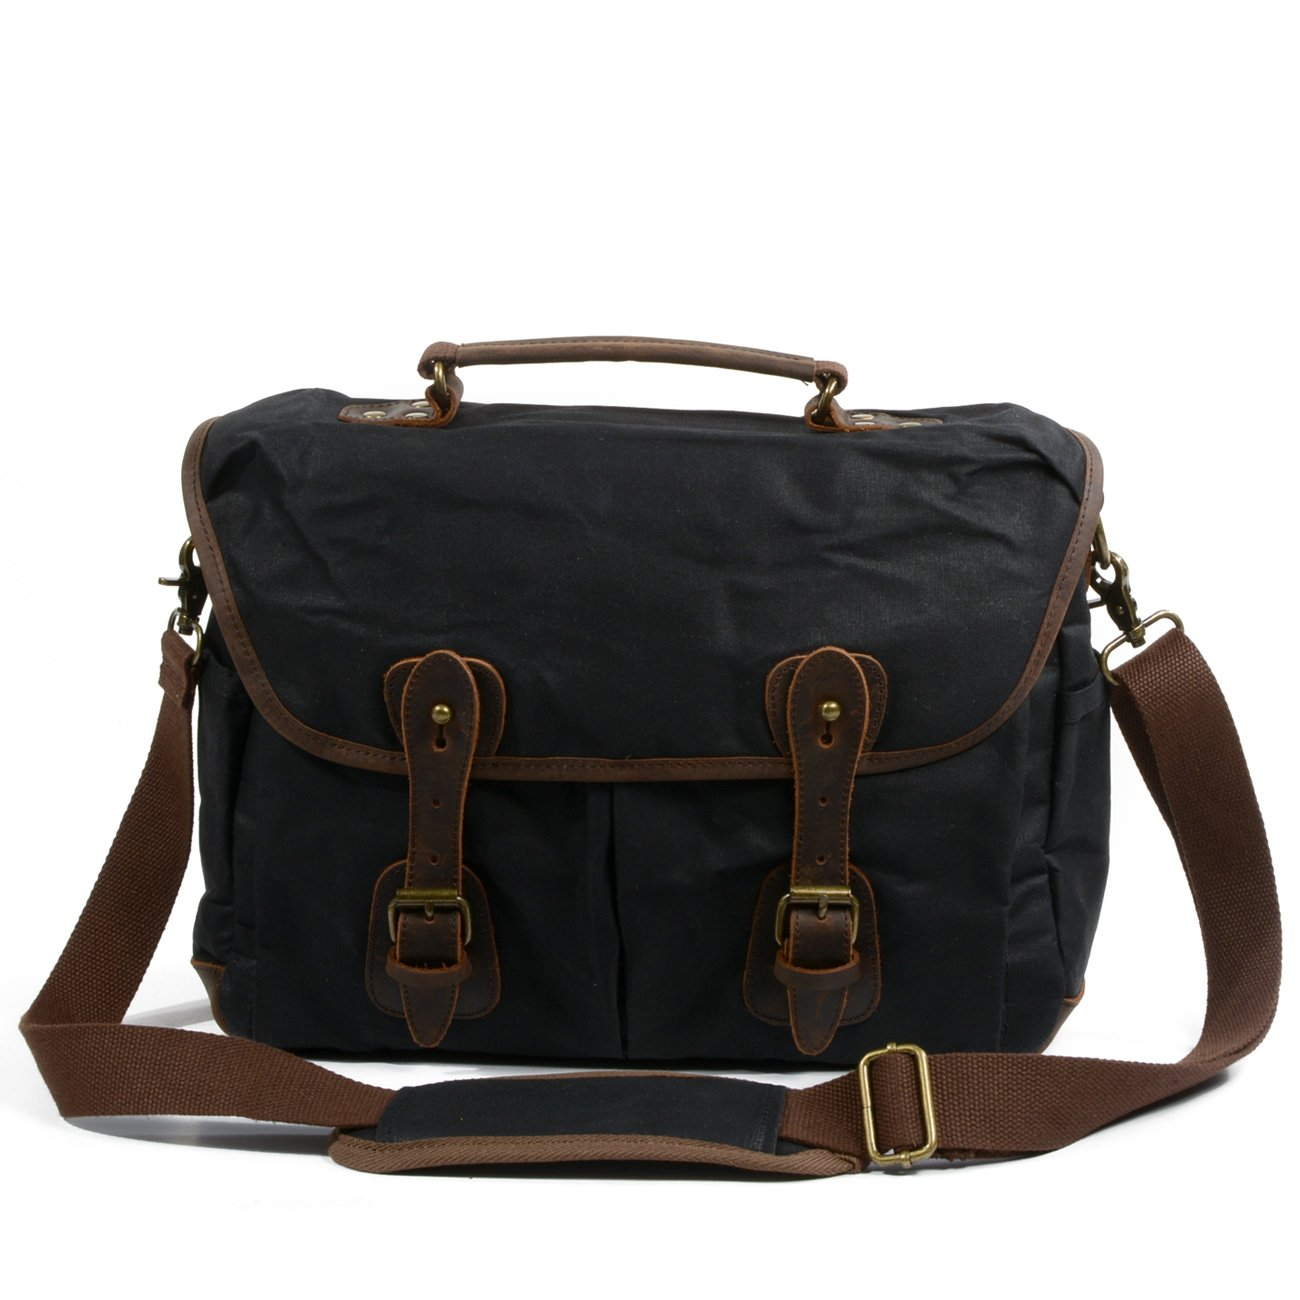 Peacechaos Men's Canvas Leather DSLR SLR Vintage Camera Messenger Bag (Black-2)